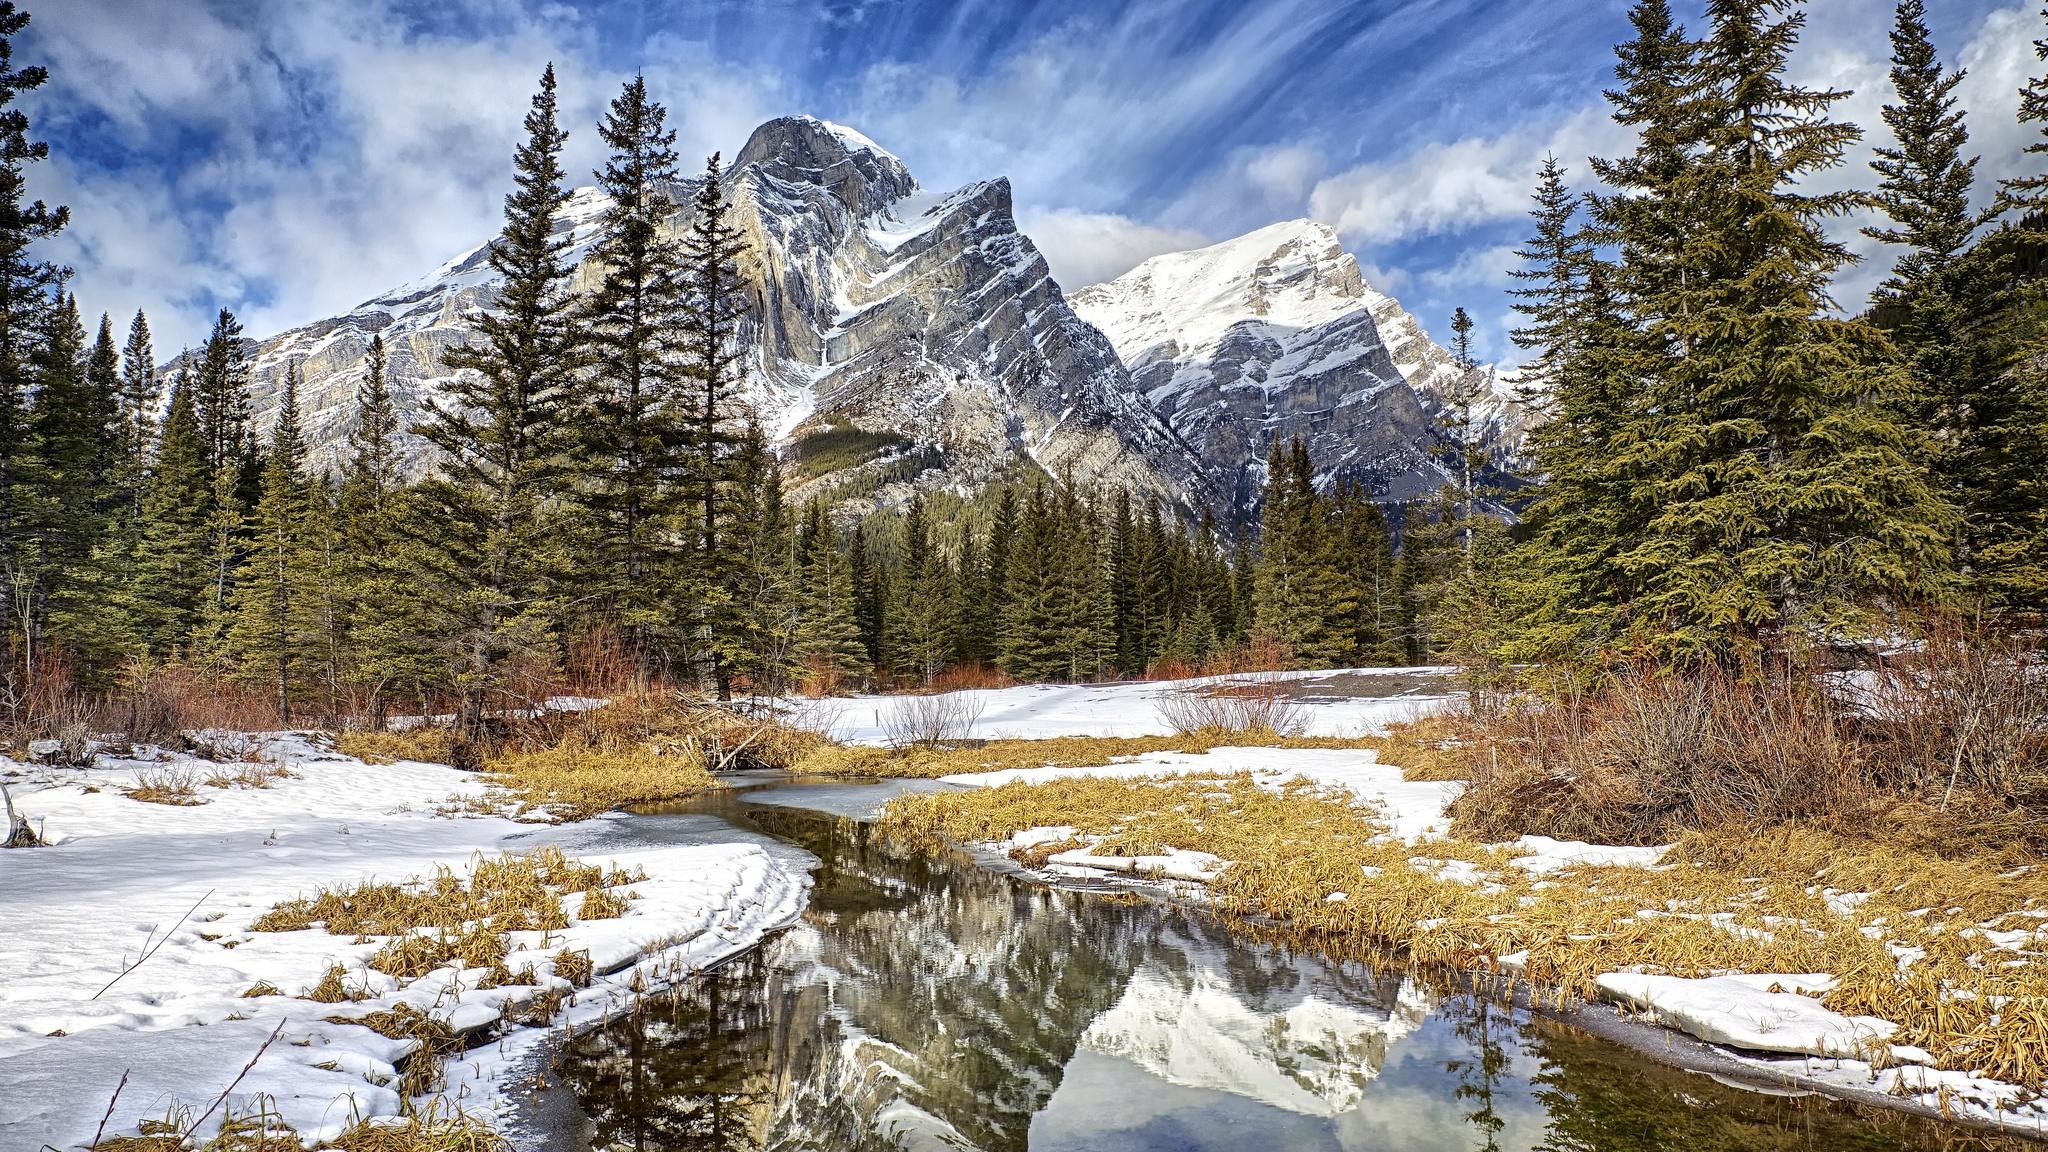 Winter Mountains Hd Desktop